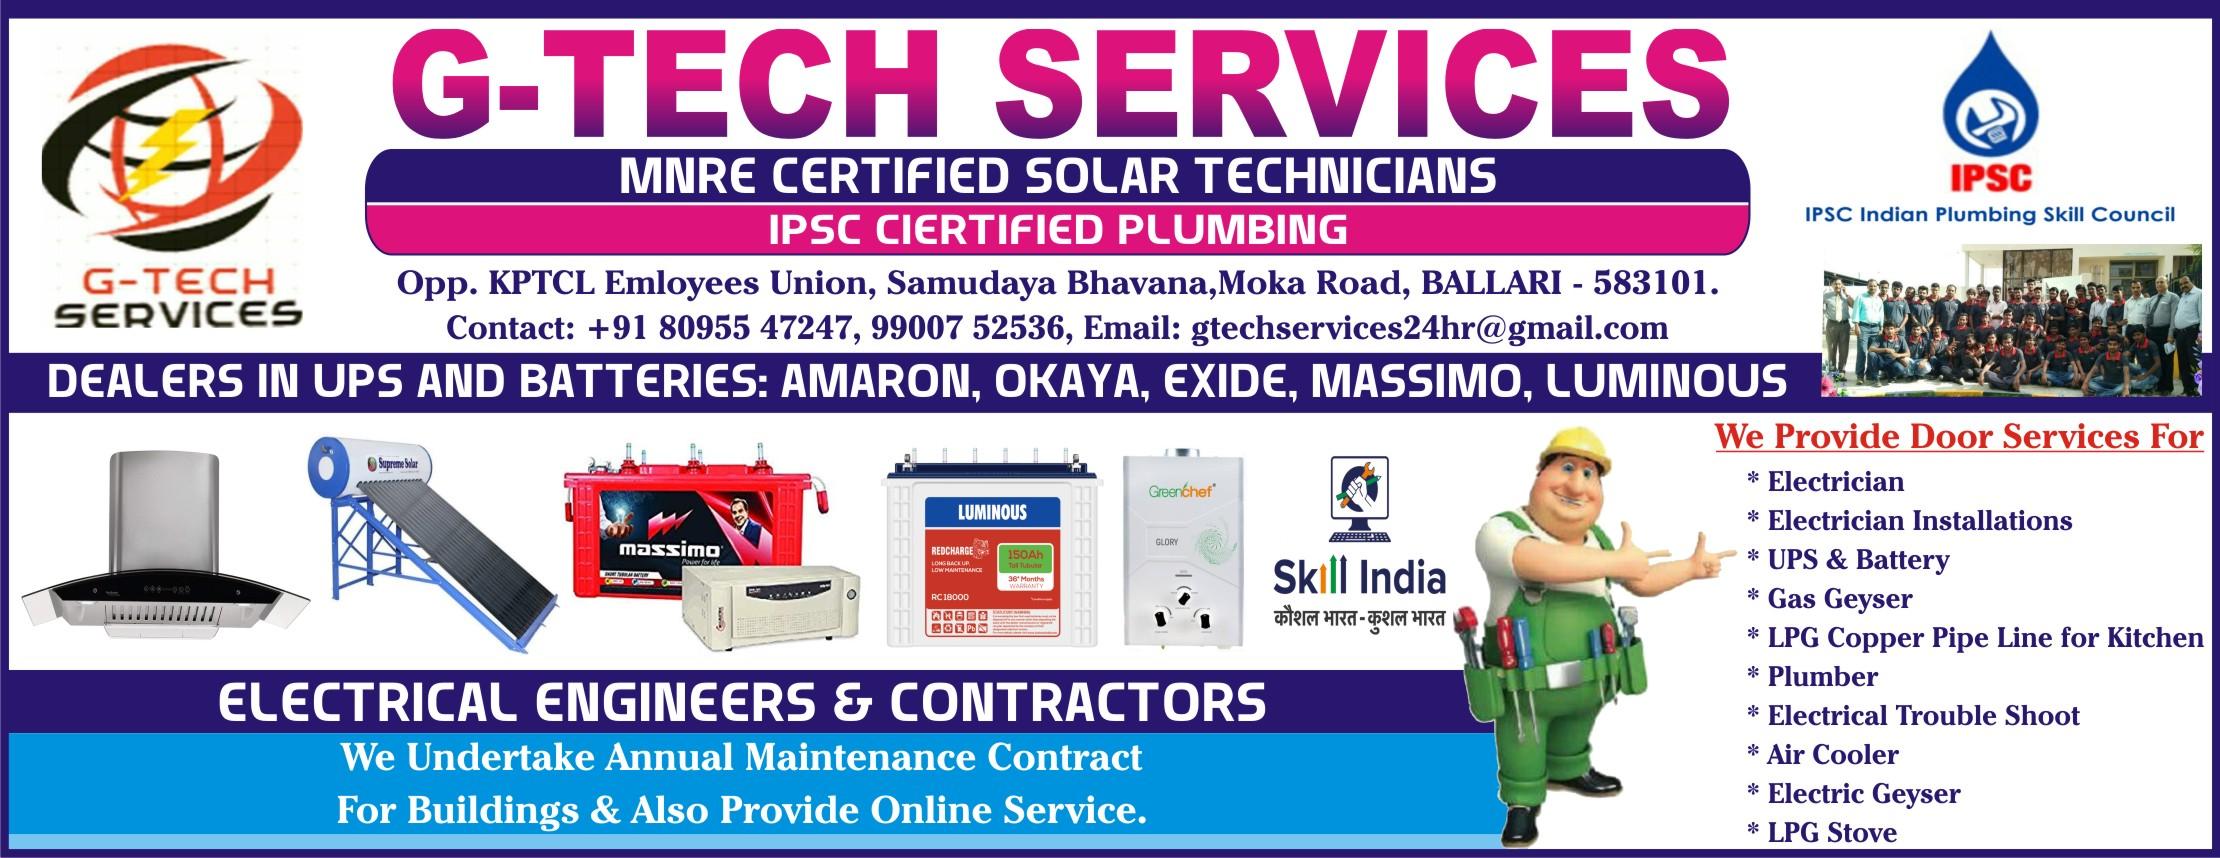 G-TECH SERVICES